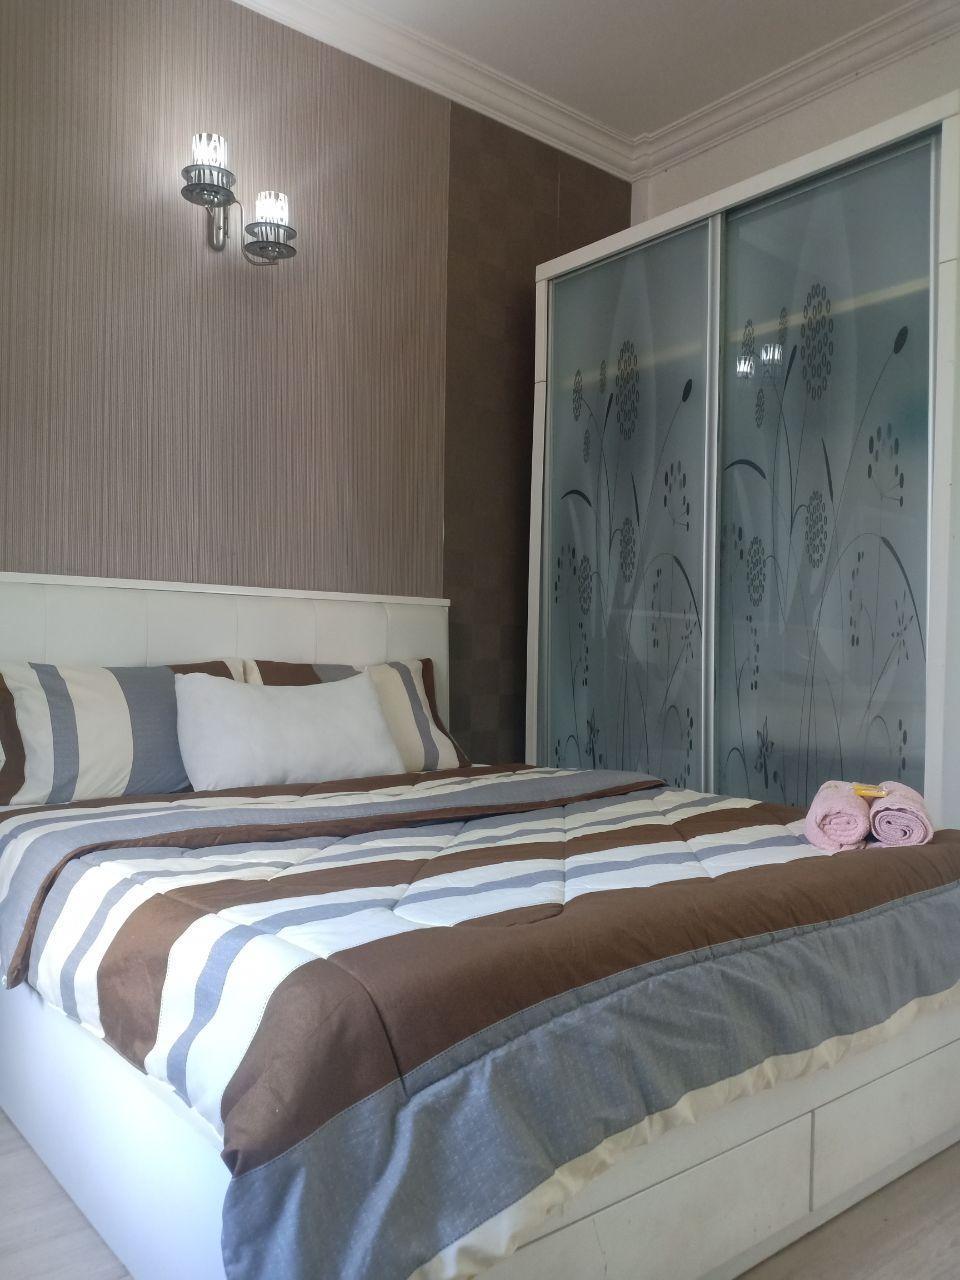 Seribu 1 Homestay 4 Rooms